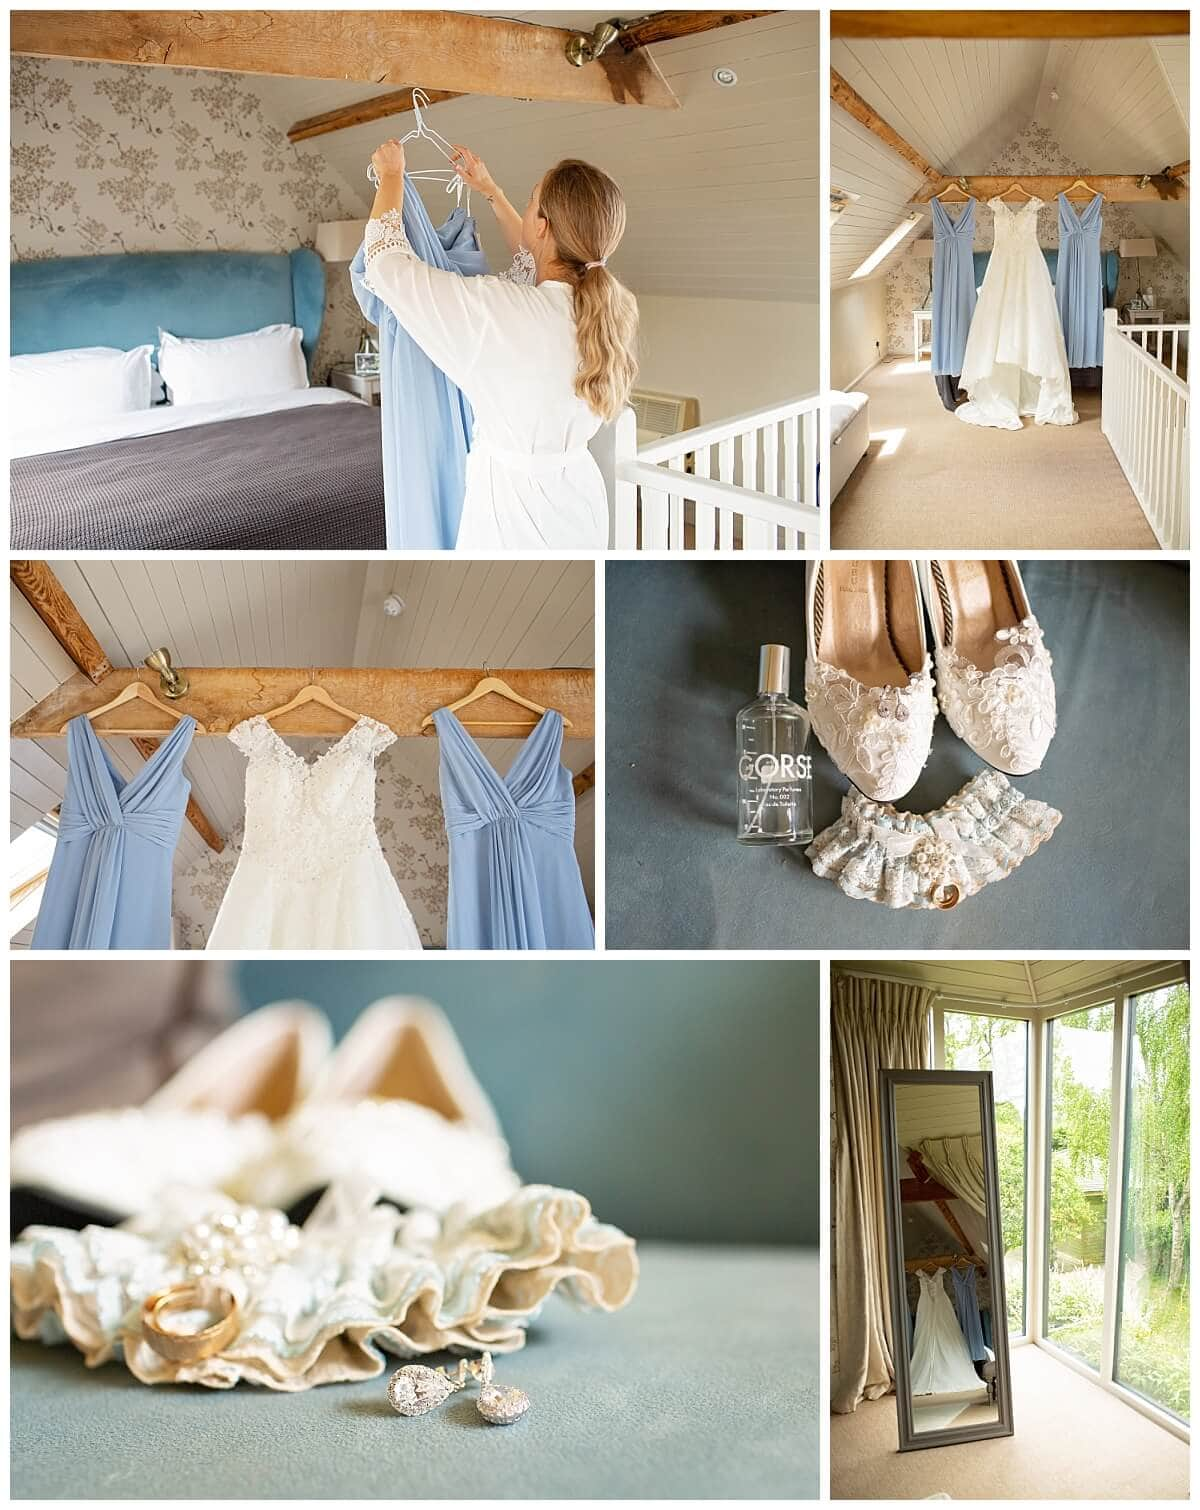 Bride hanging wedding dress at South Farm